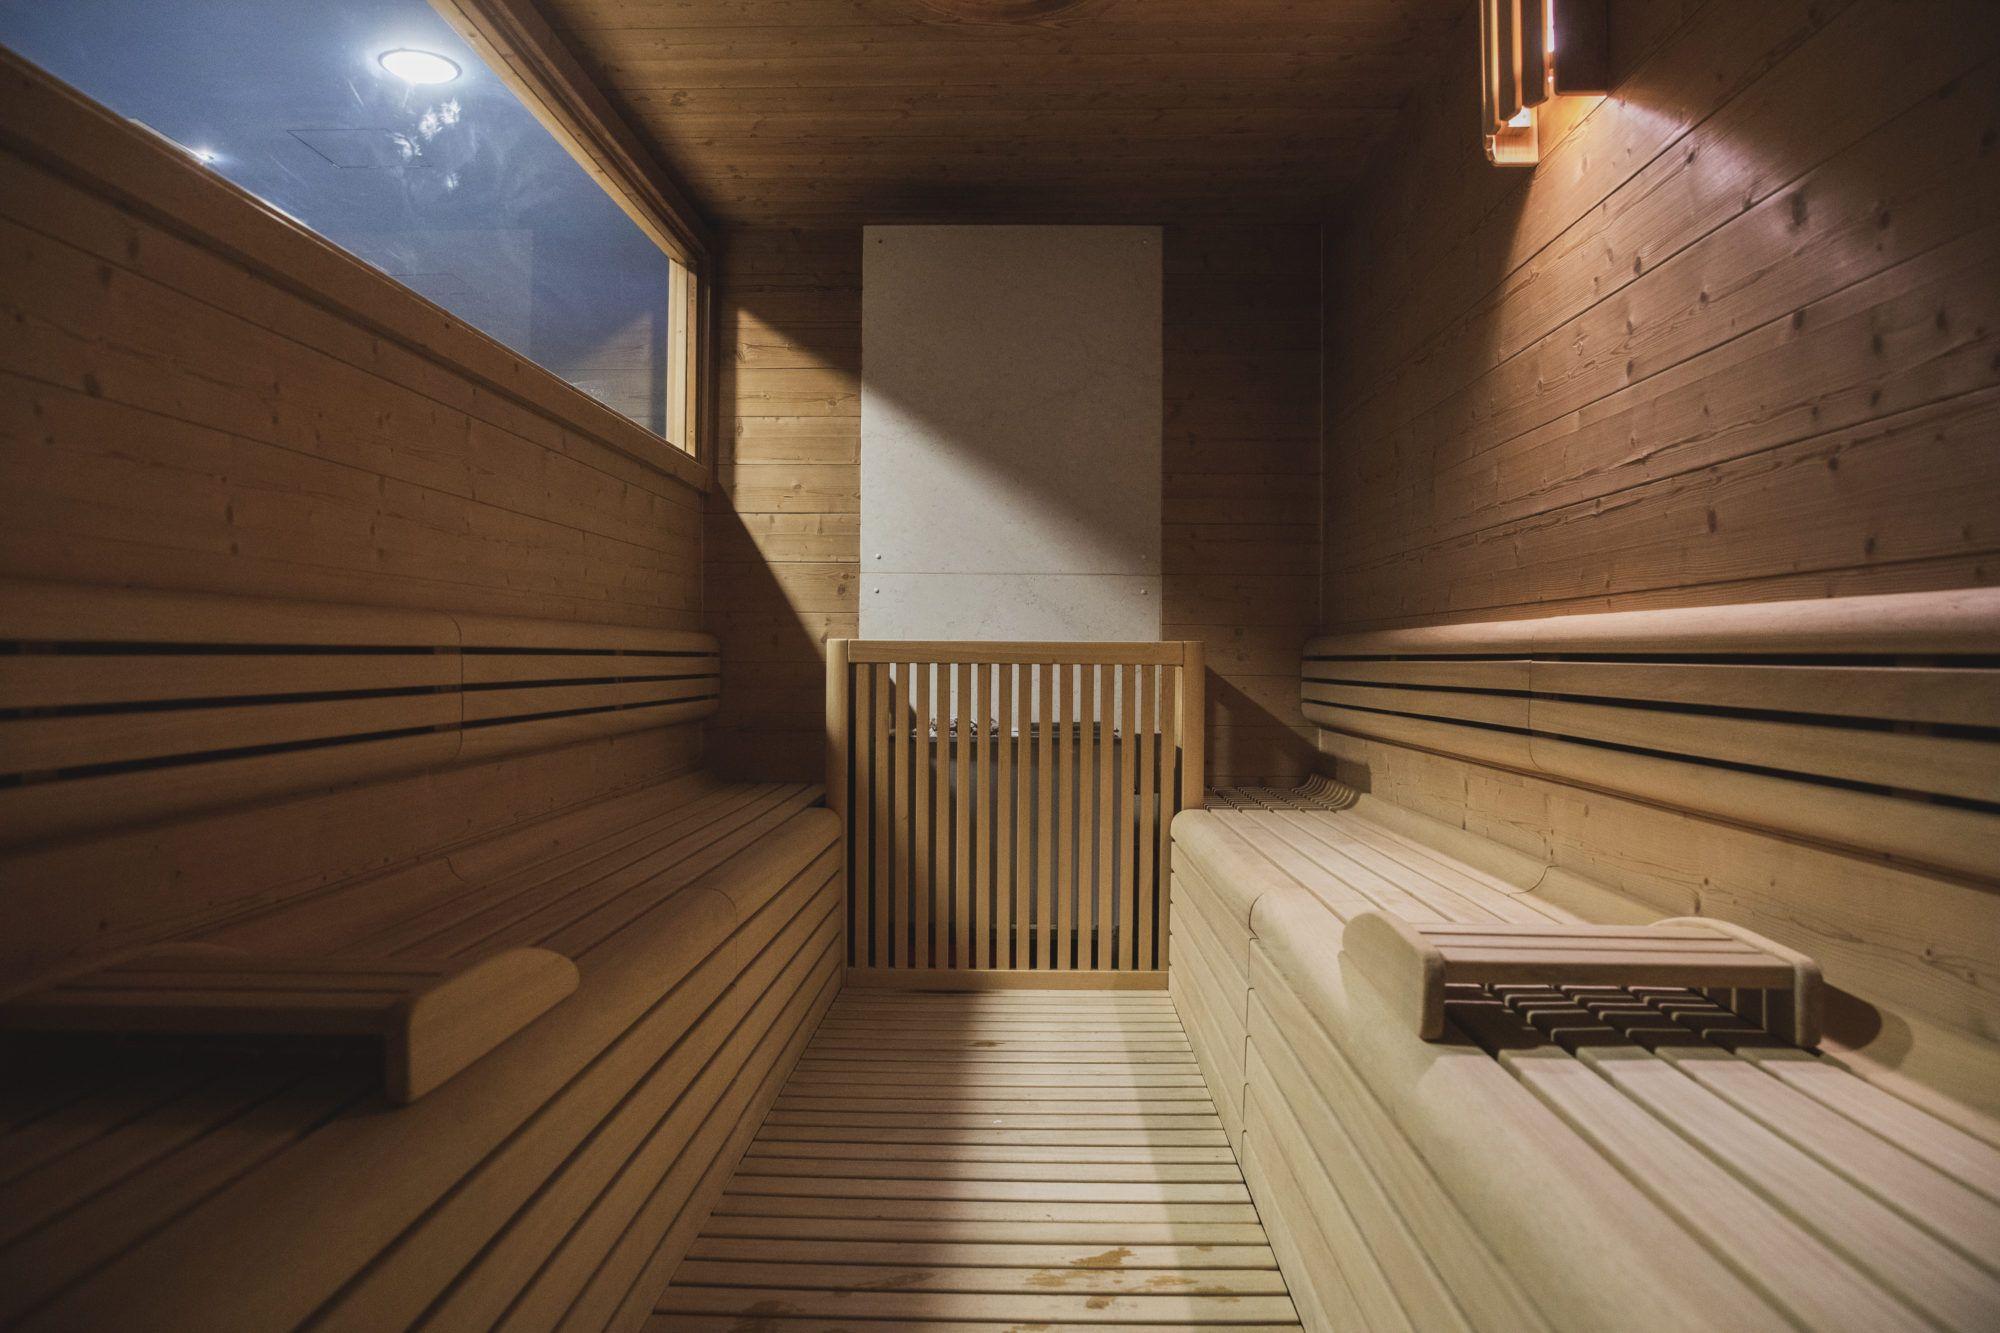 29 Hotel Rubino - Sauna